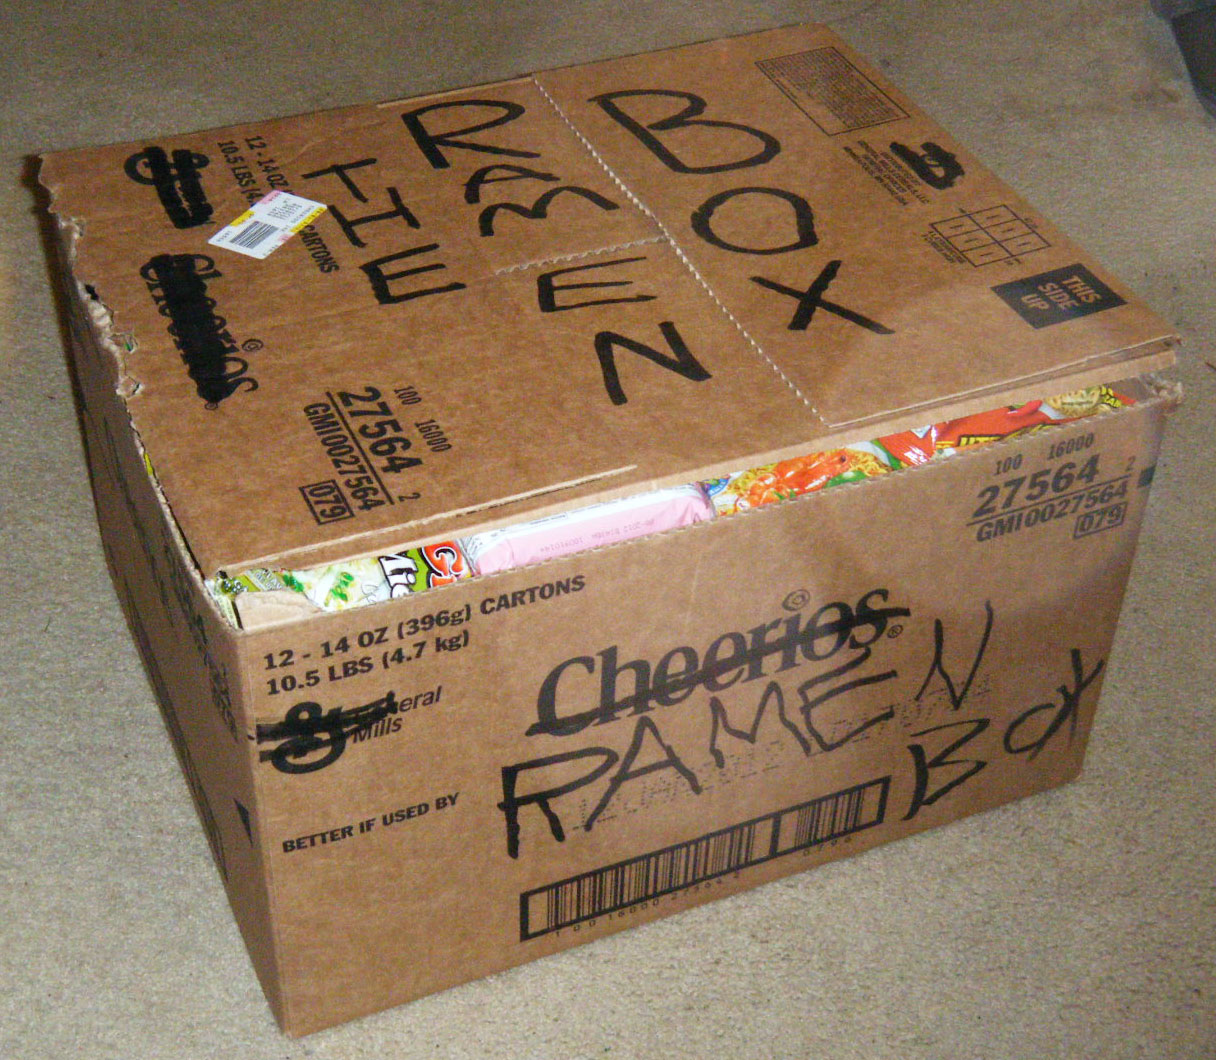 The ramen box